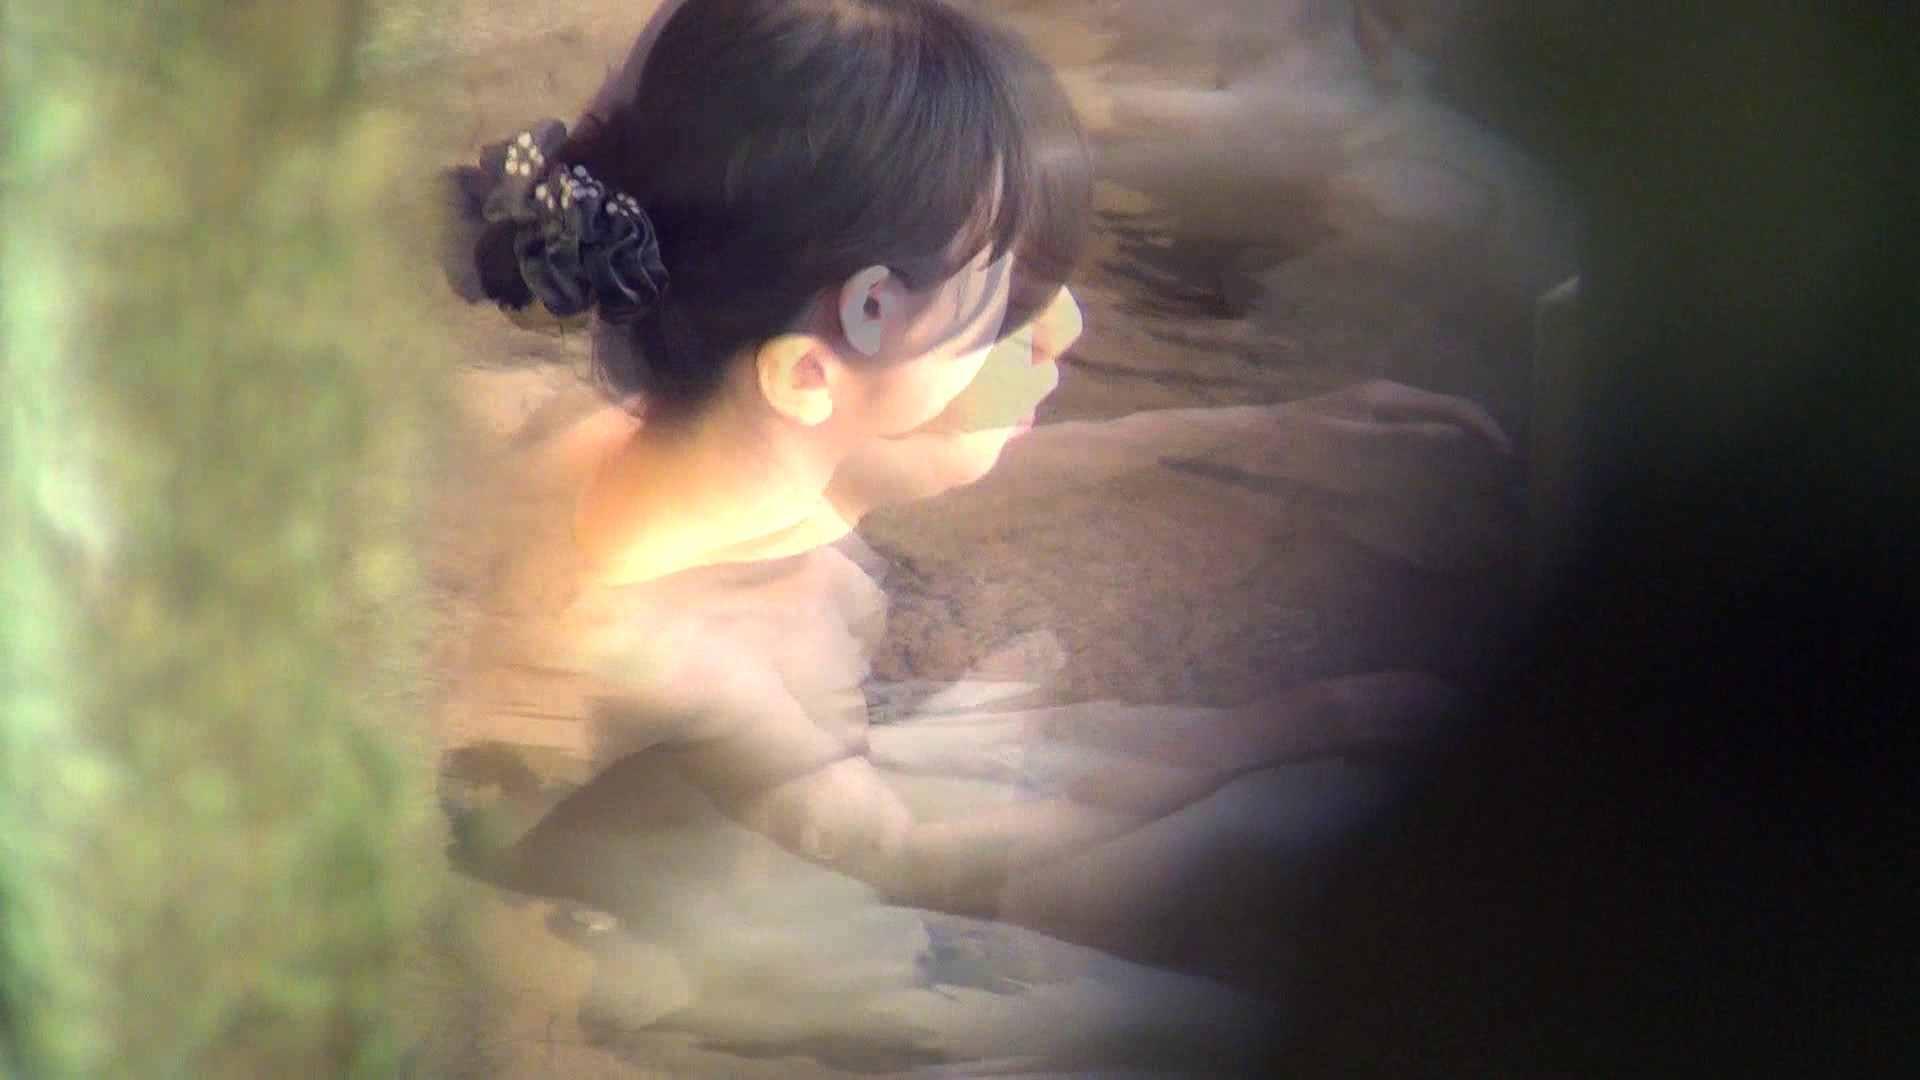 Aquaな露天風呂Vol.285 盗撮  97連発 9